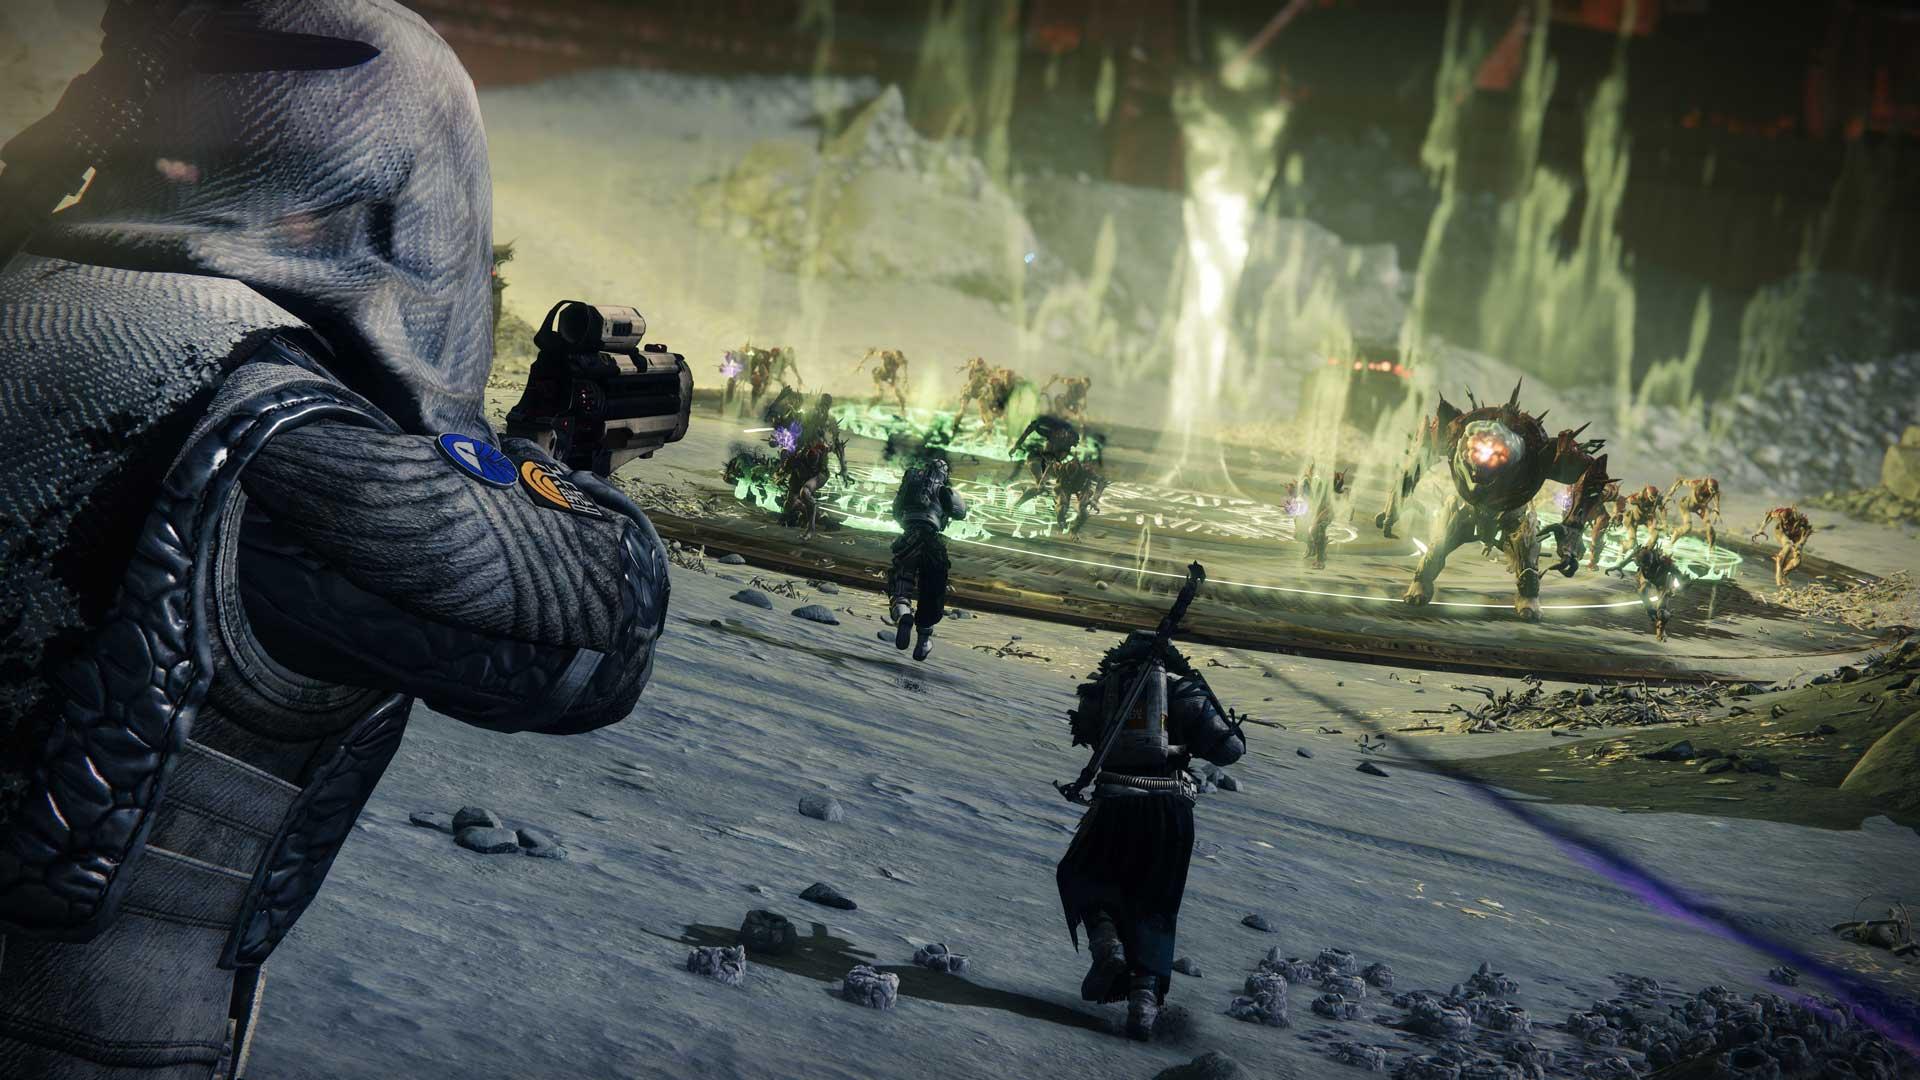 Destiny 2: Shadowkeep (Steam Code For PC)